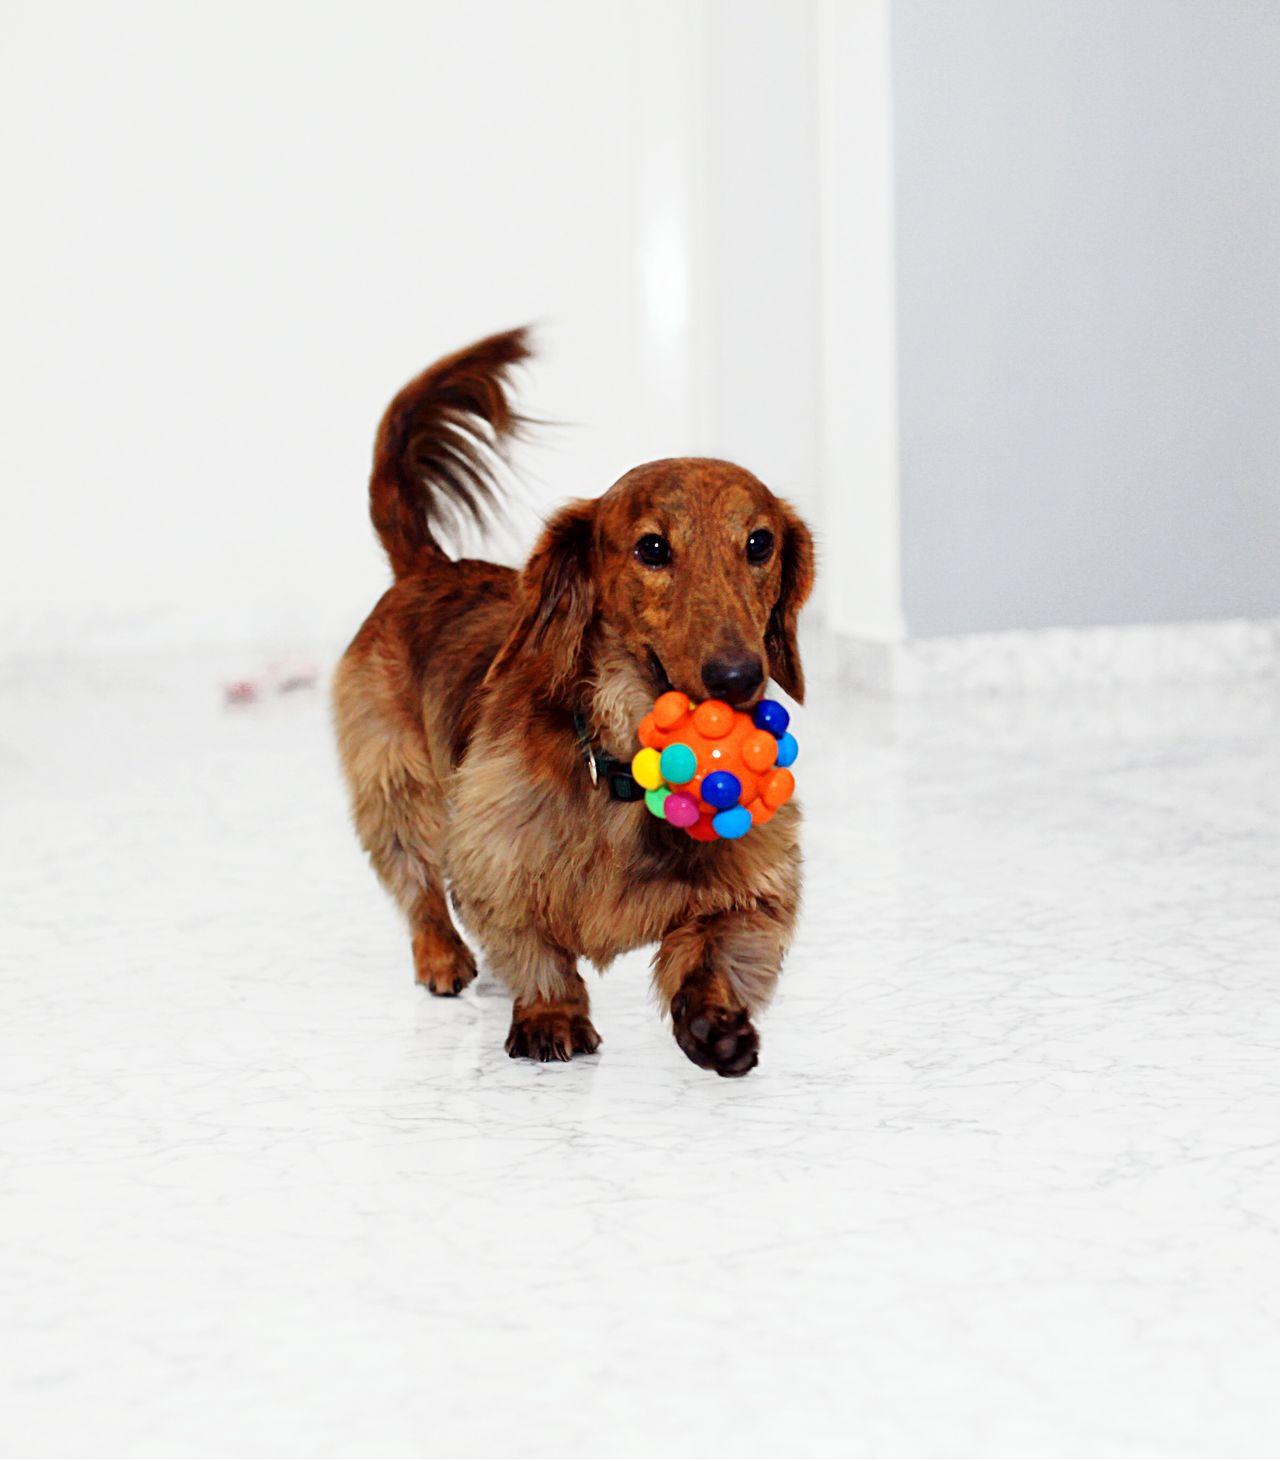 I Love My Dog Pets Corner Pet Photography  Dachshund Pet Dog Love Cute Pets Pets